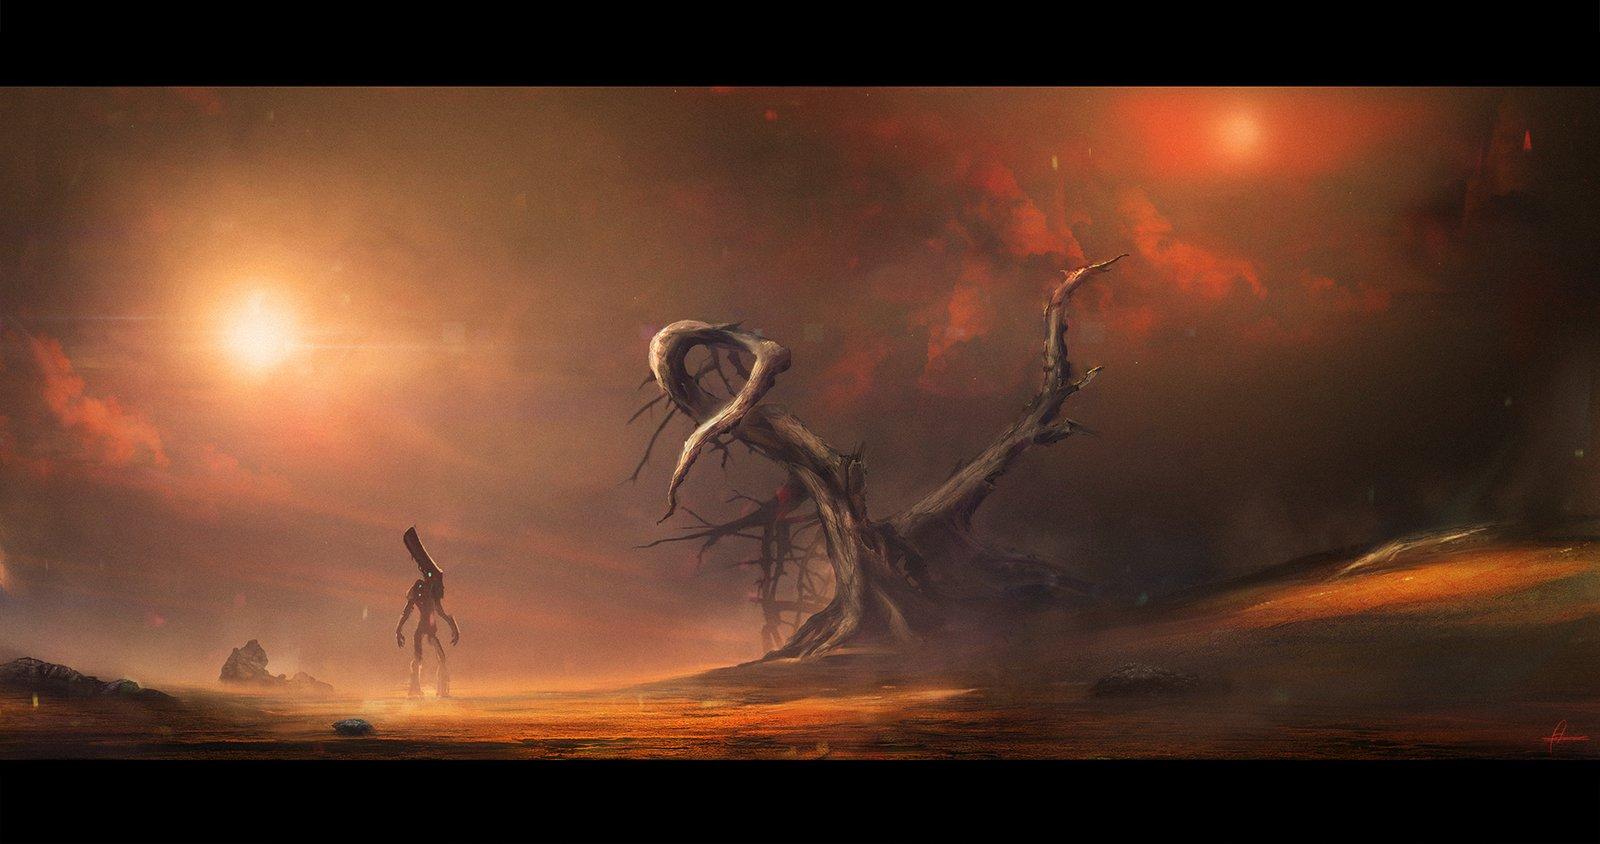 Extraterrestrial Tree